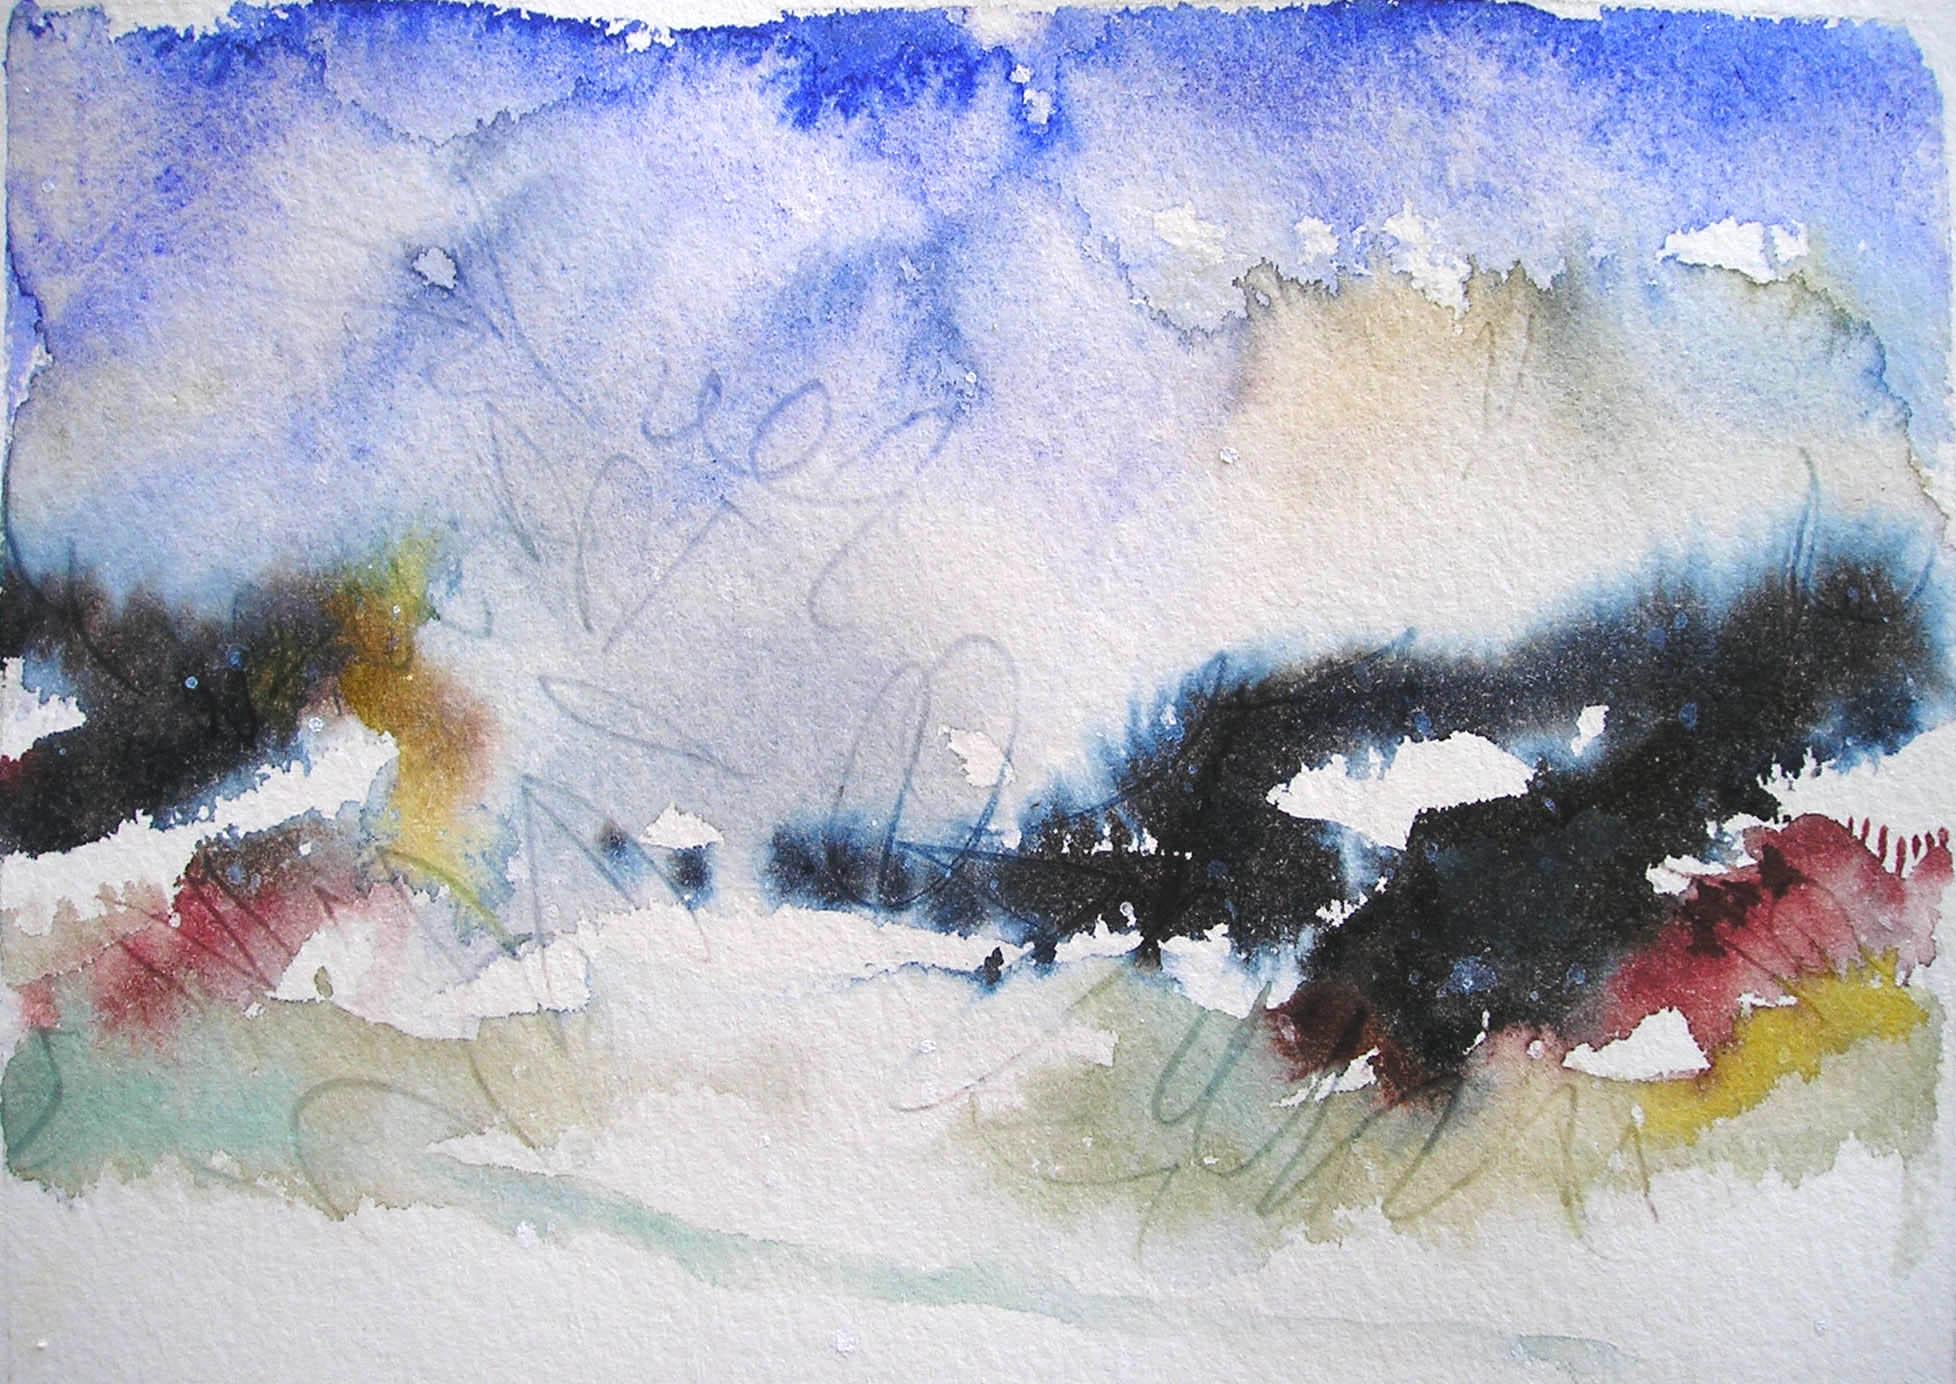 Simple Watercolor Paintings For Beginners